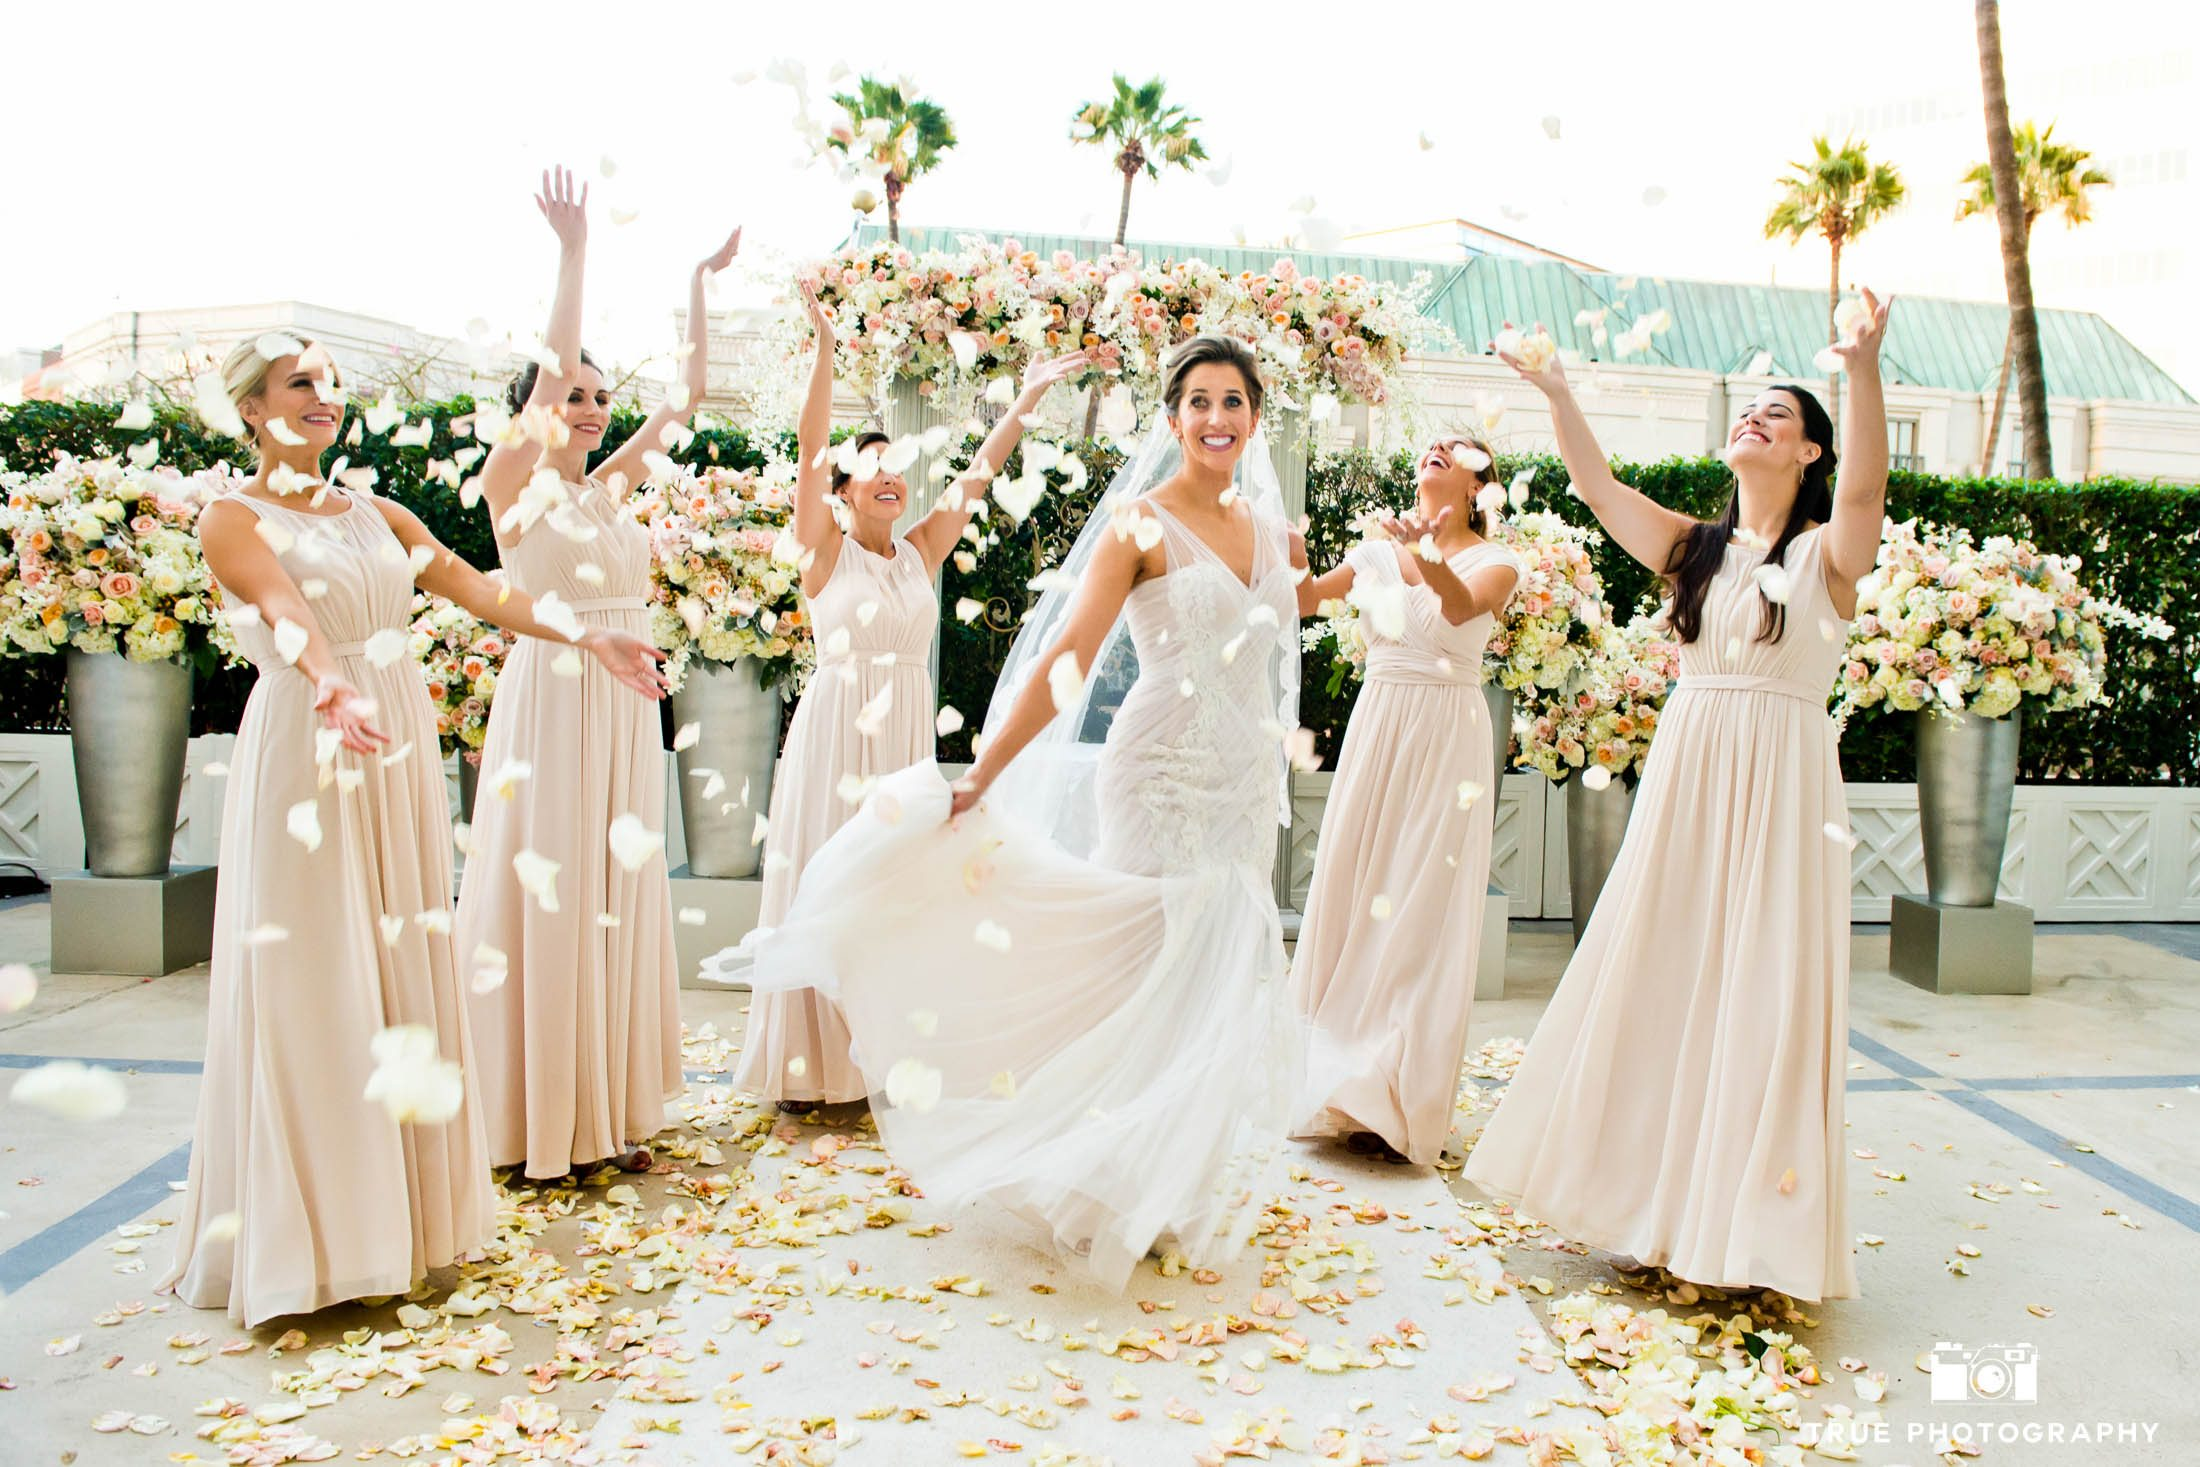 Bridesmaids throw rose petals around Bride after ceremony